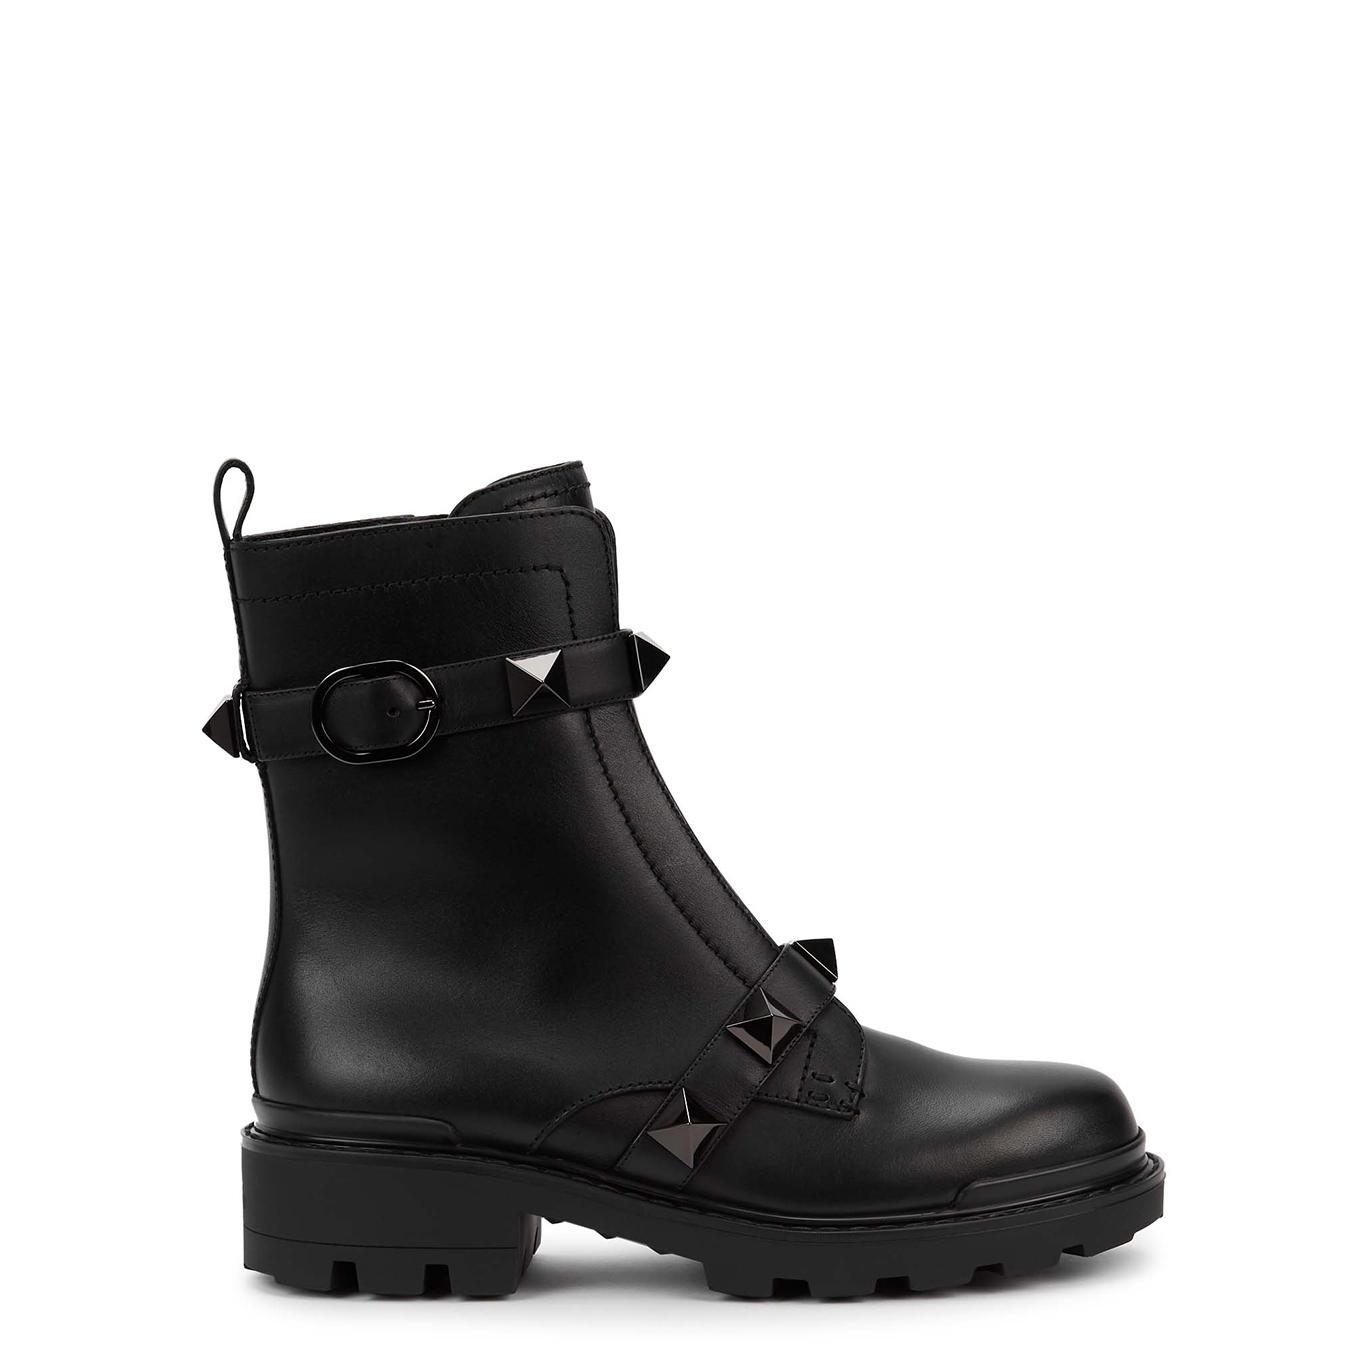 Valentino Garavani Roman Stud black leather ankle boots